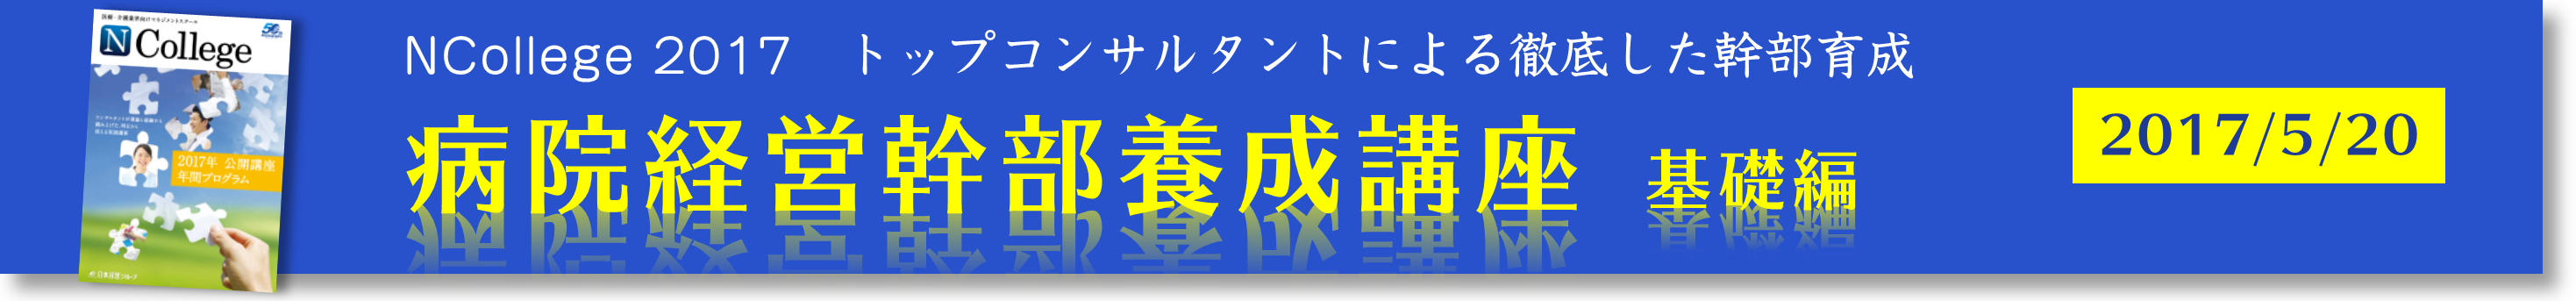 banner_20170520